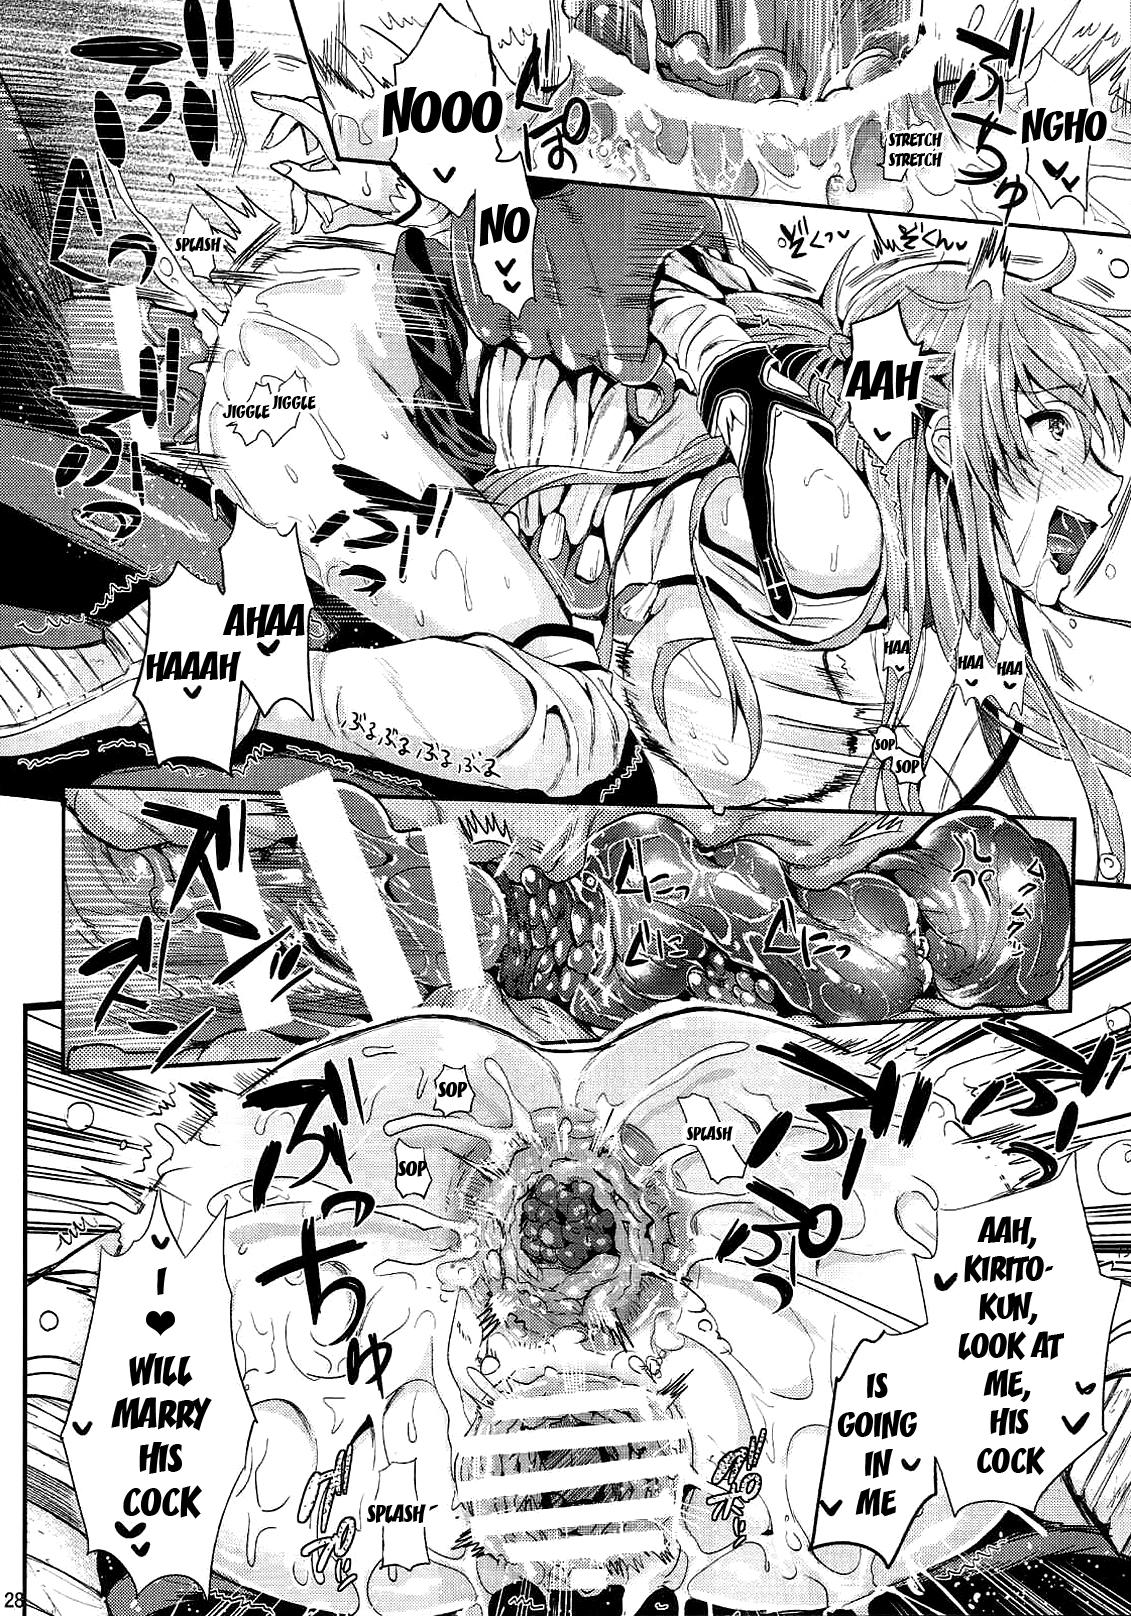 [YURIRU-RARIKA (Kojima Saya, Lazu)] Shujou Seikou 2 Bangai-hen | Captive Sex 2 - Extra Chapter (Sword Art Online) [English] {doujin-moe.us} 26